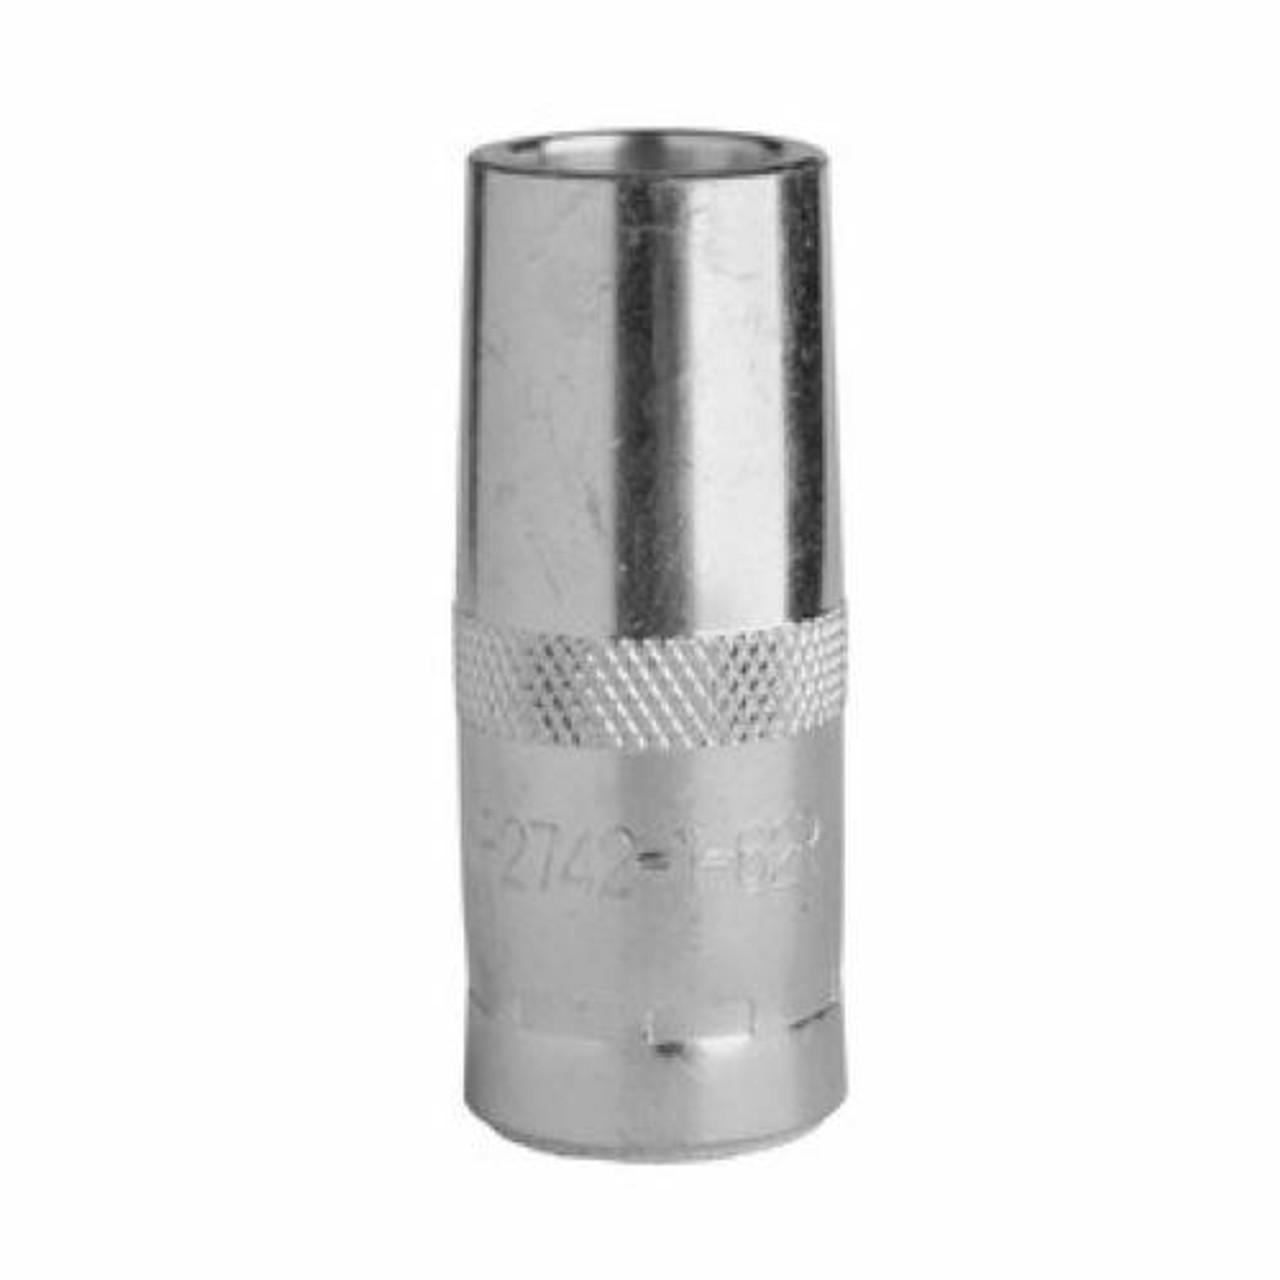 Lincoln 350A Thread-on Nozzle Flush 5/8 in 15.9 mm Inner Diameter KP2742-1-62F